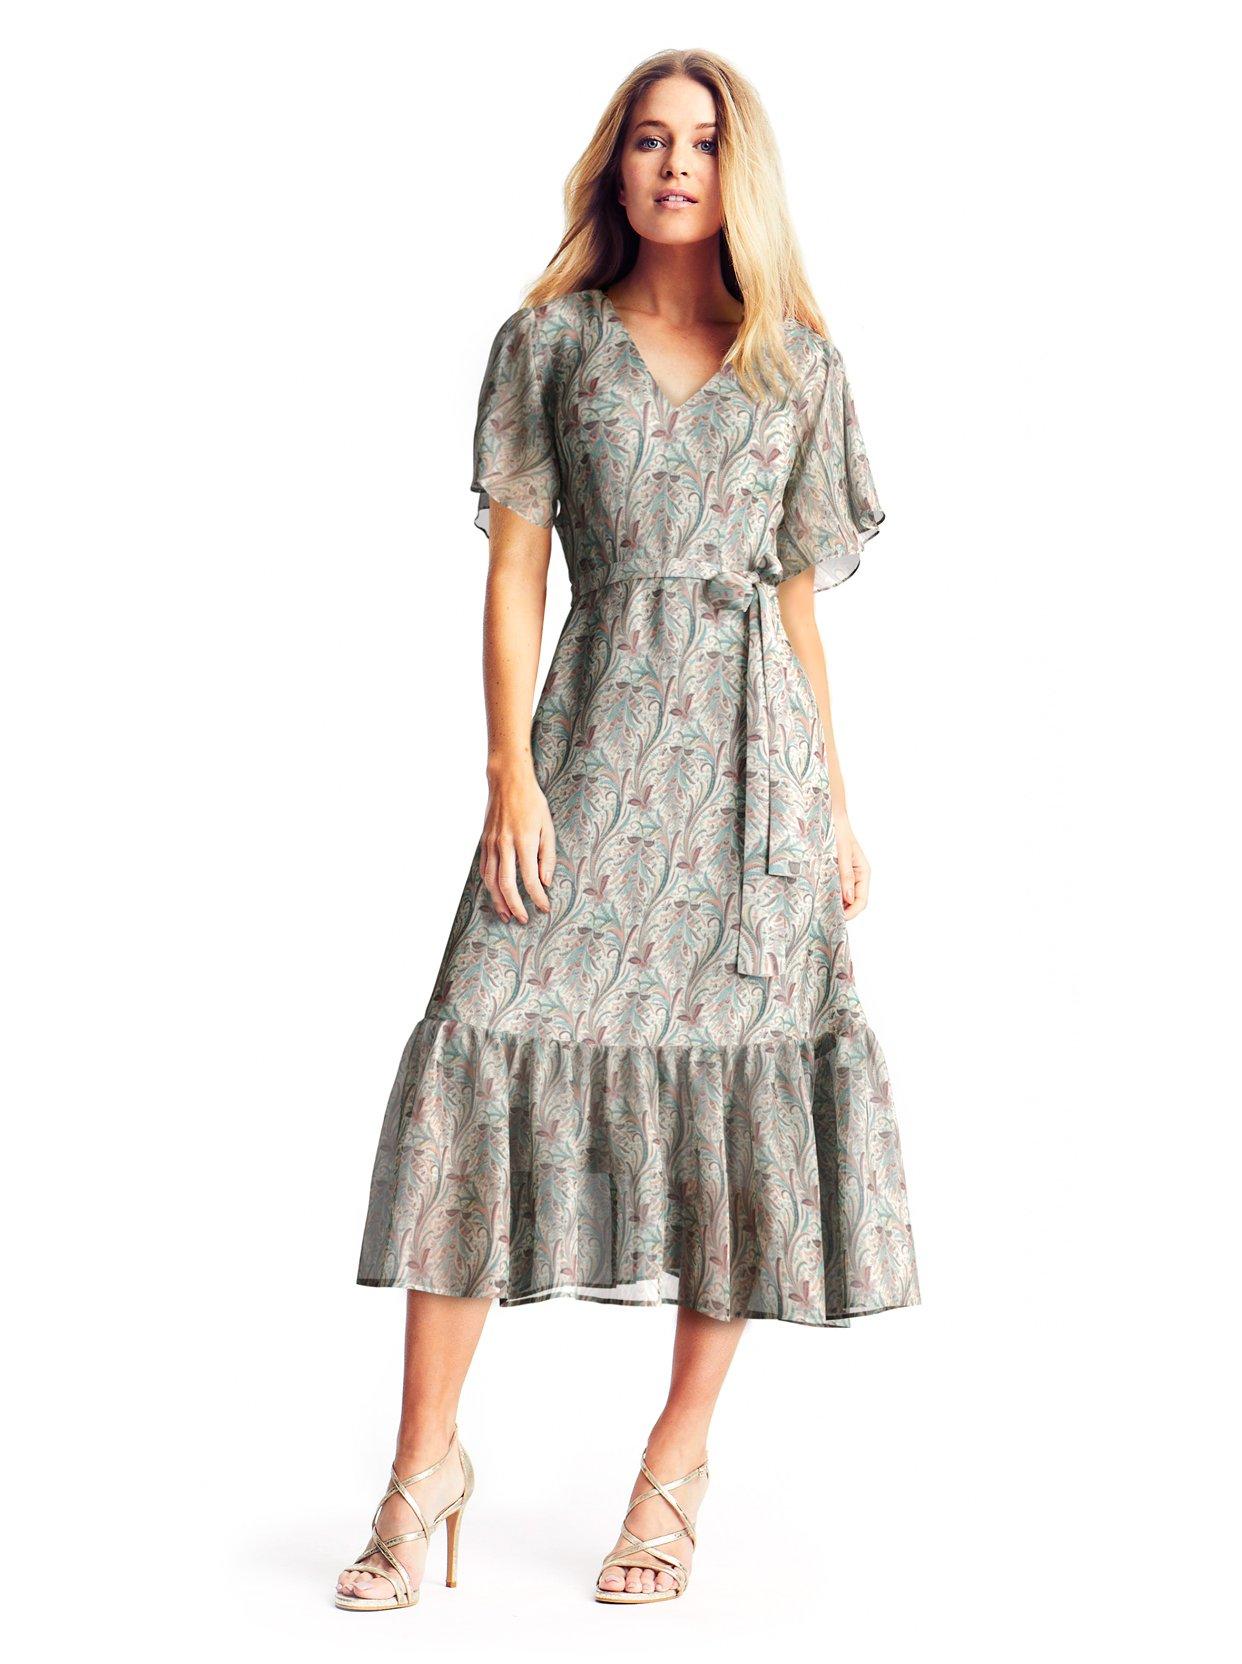 Ridley_London_Green_Elegance_Virginia_Midi_Dress_Kate_Middleton_Duchess_of_Cambridge.jpg